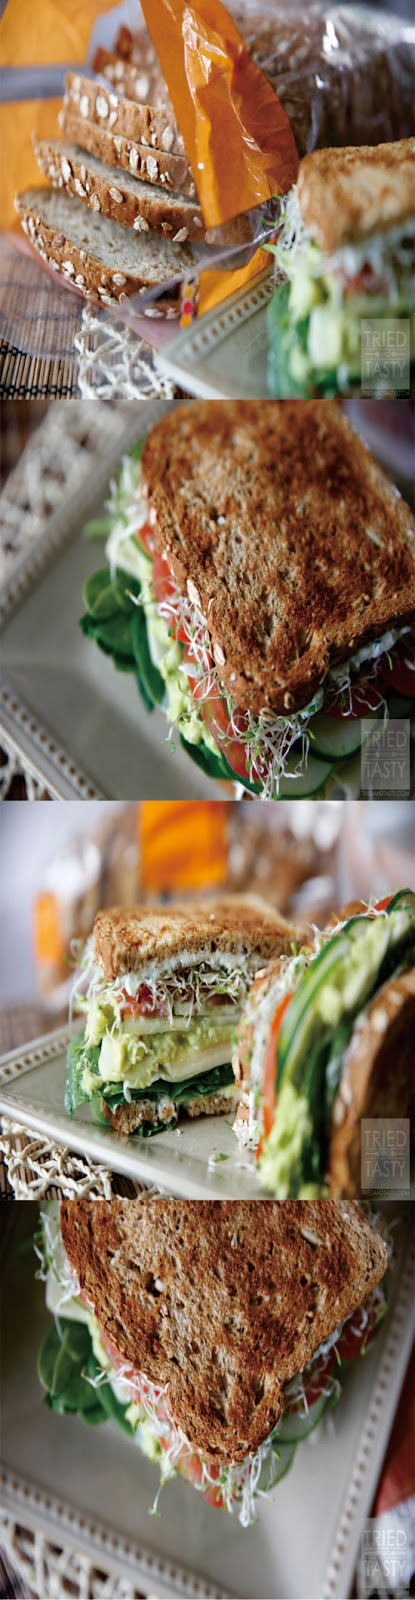 THE ULTIMATE VEGGIE SANDWICH HEALTHY RECIPE